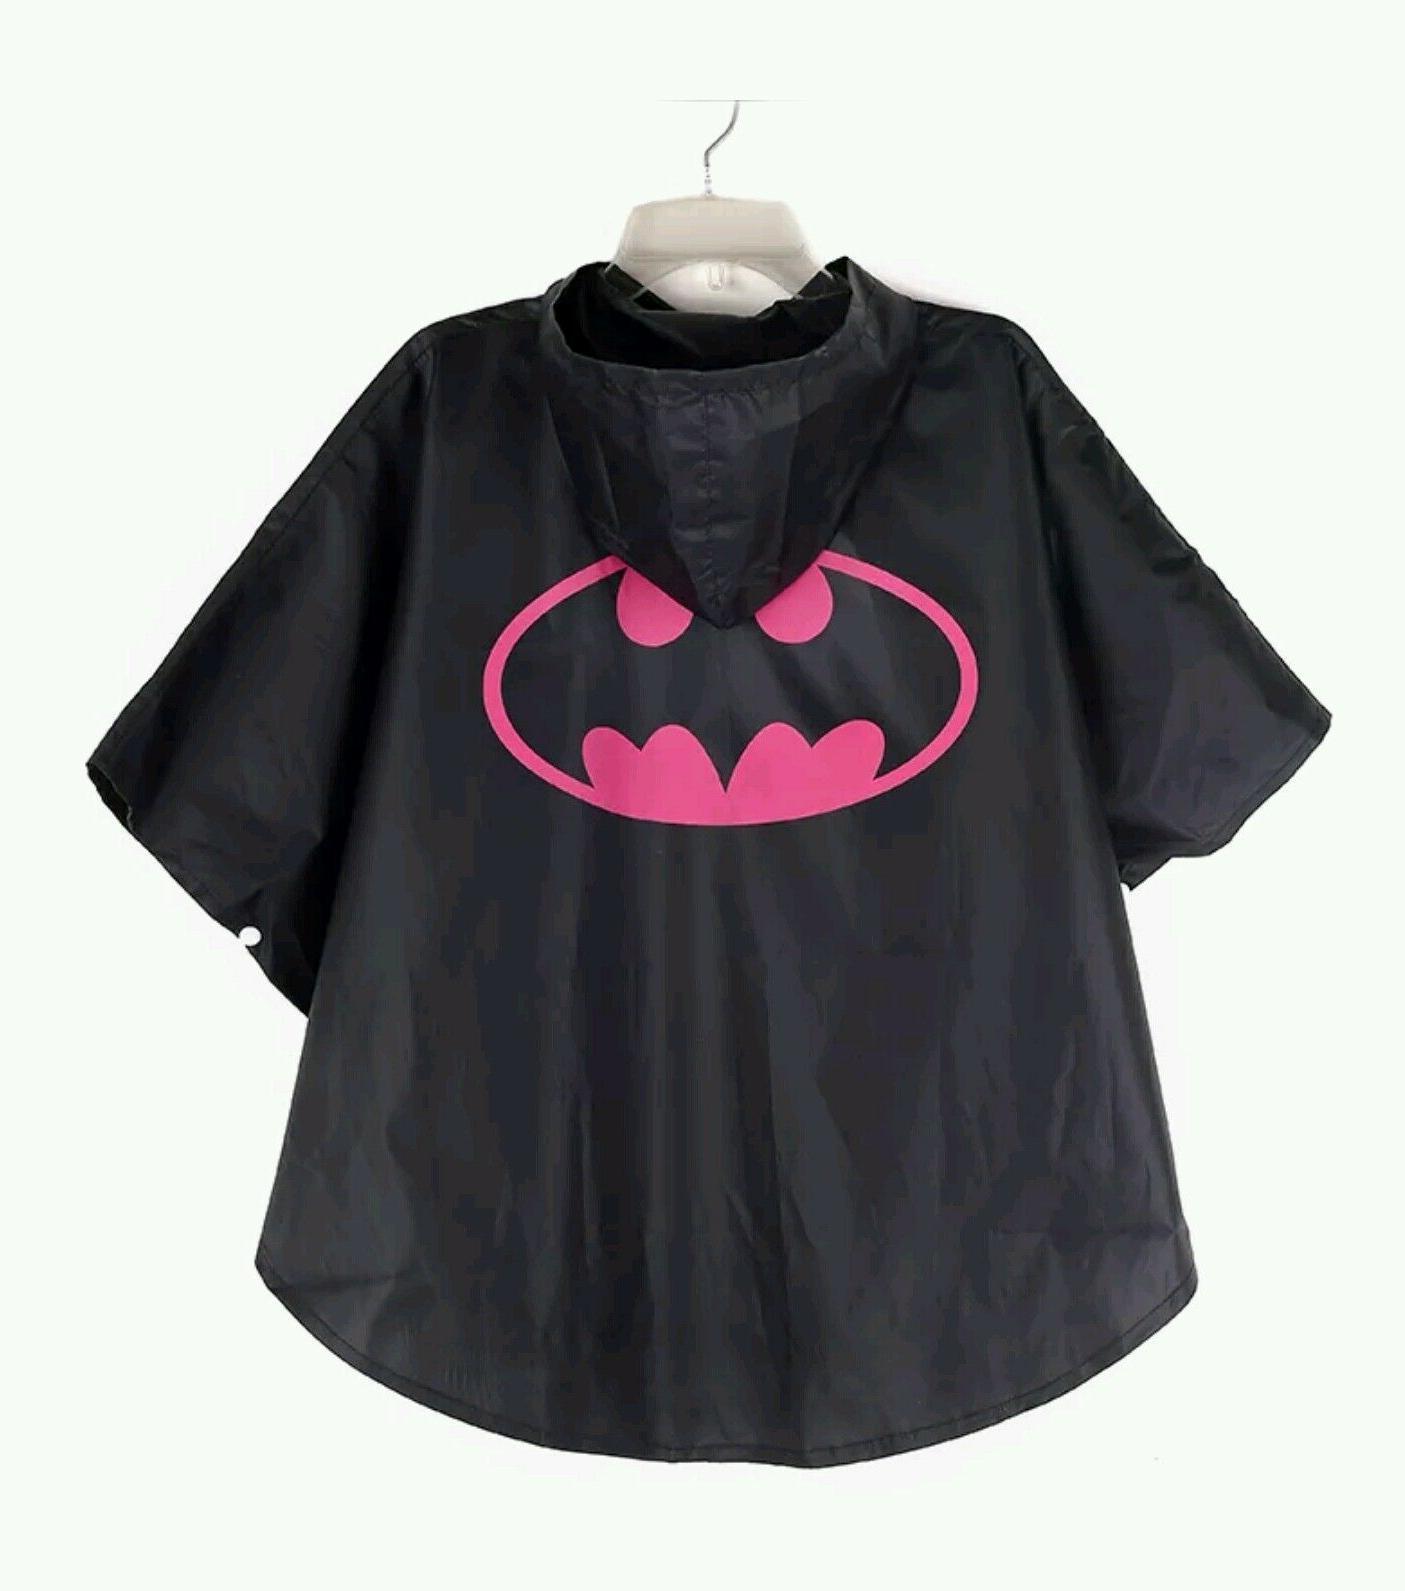 New Kids Superhero Rainsuit